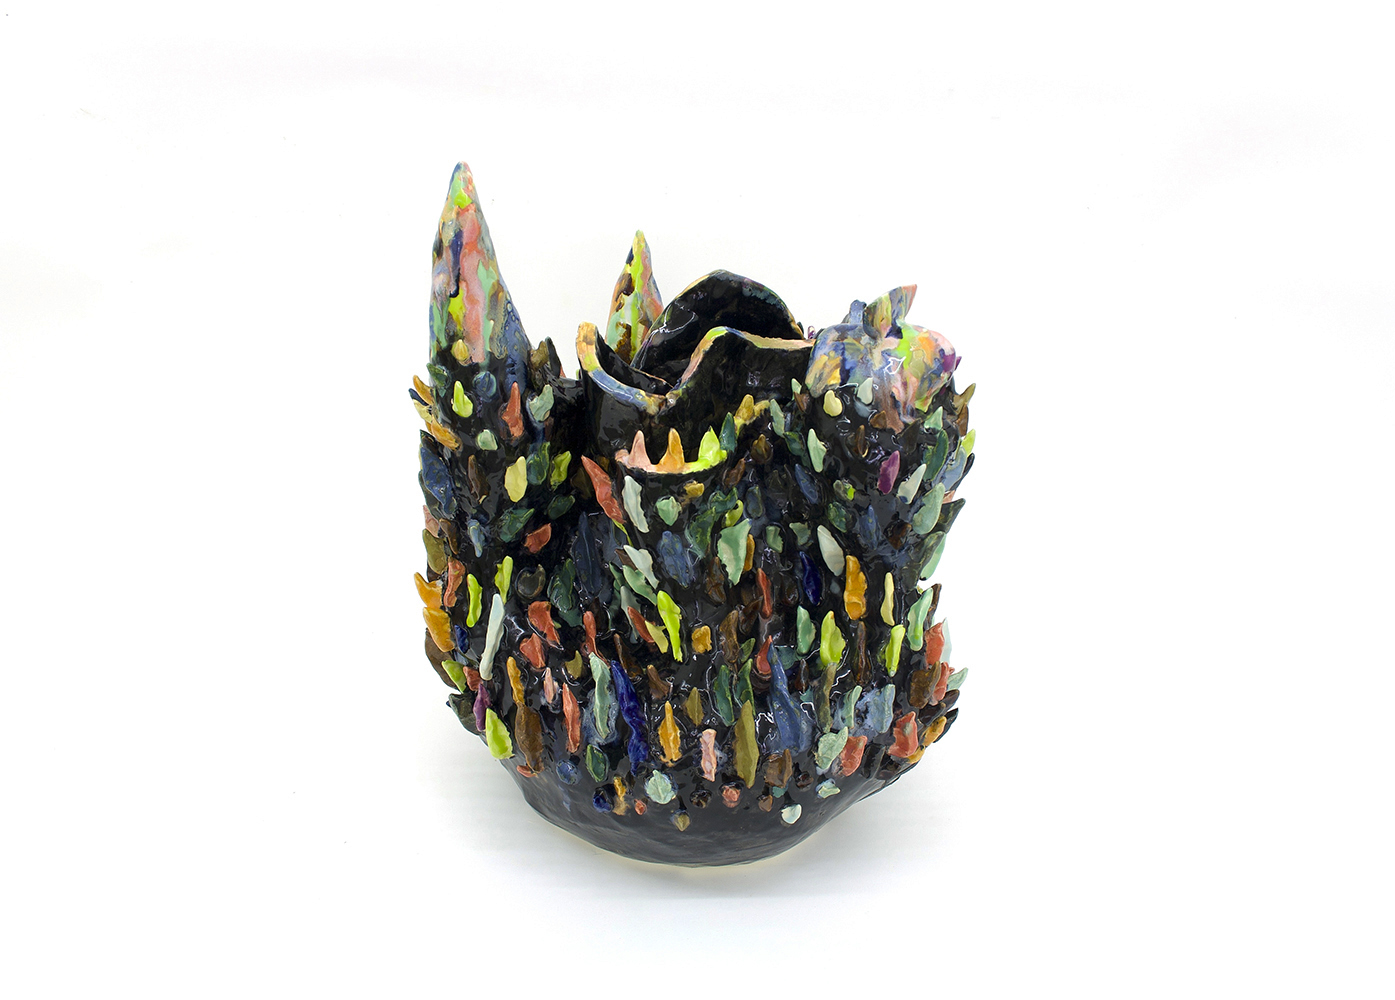 "Philippe Caron Lefebvre,  Château à pointes , 2019, ceramic and glaze, 43 x 33 x 33 cm (18"" x 13"" x 13"")"